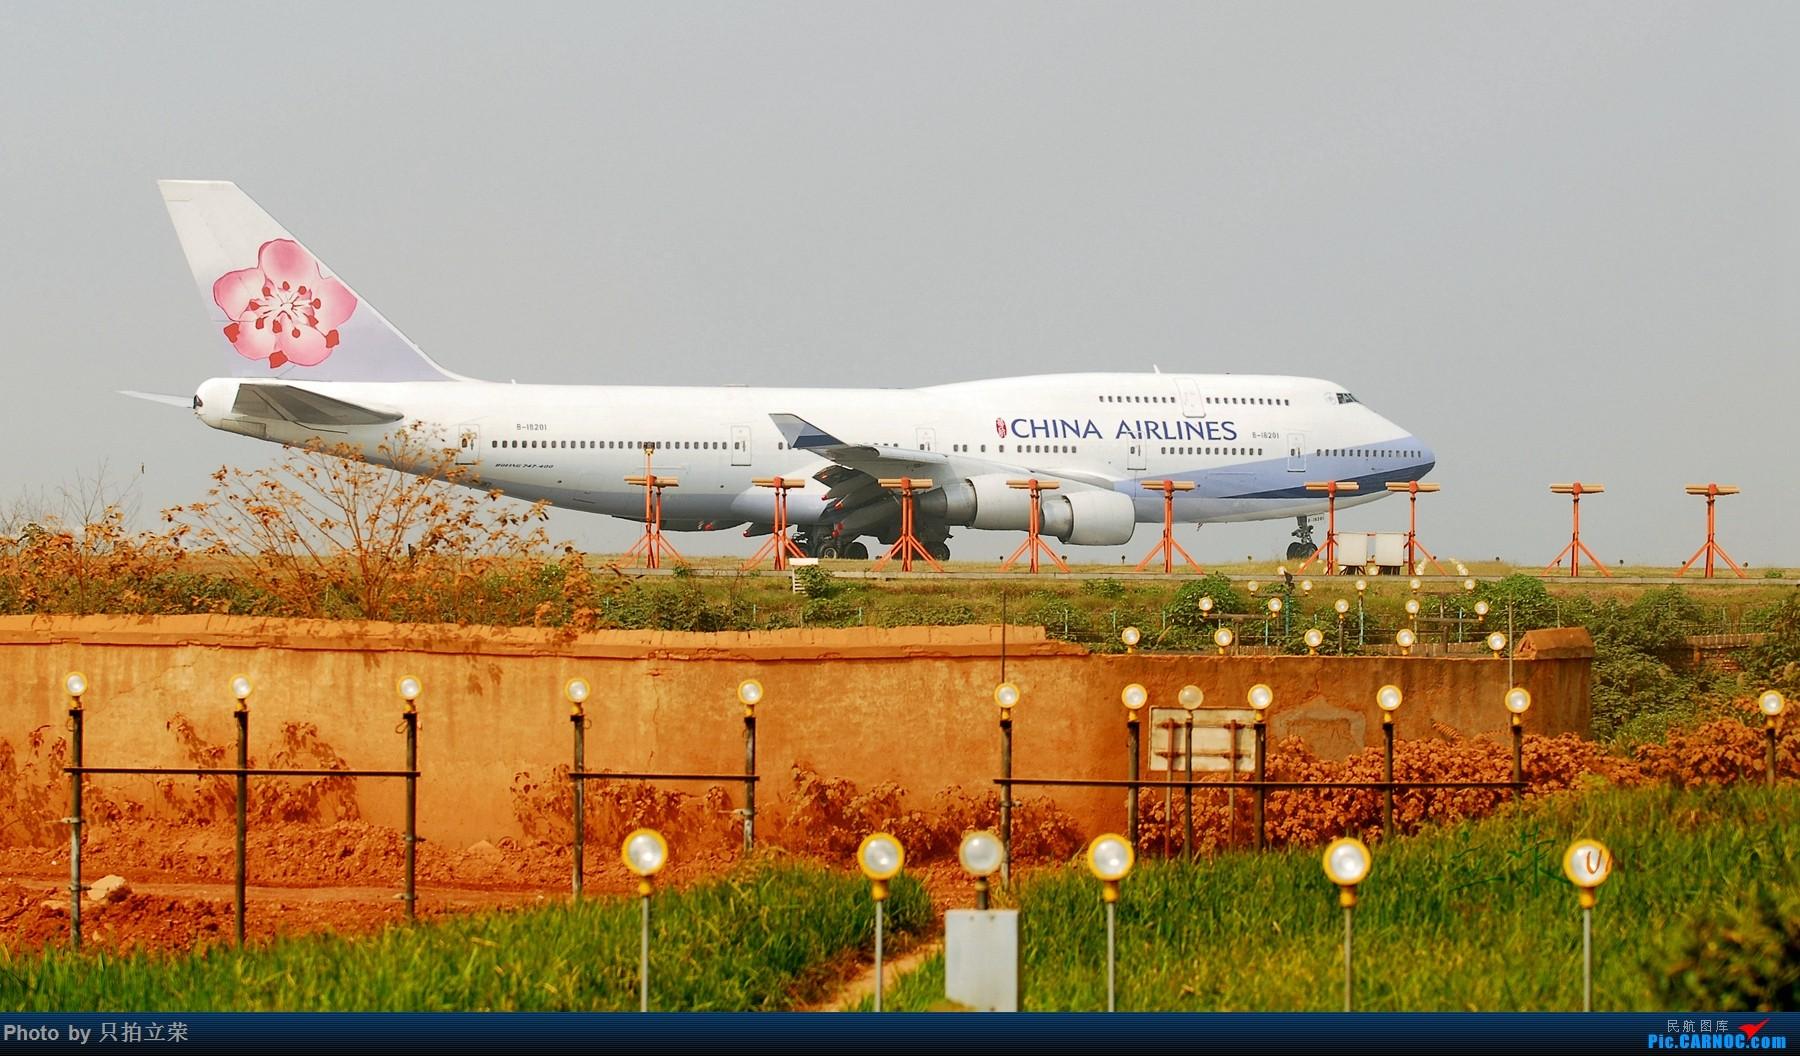 Re:[原创]第一次发图,长沙的大梅花们 BOEING 747-400 B-18201 中国长沙黄花国际机场